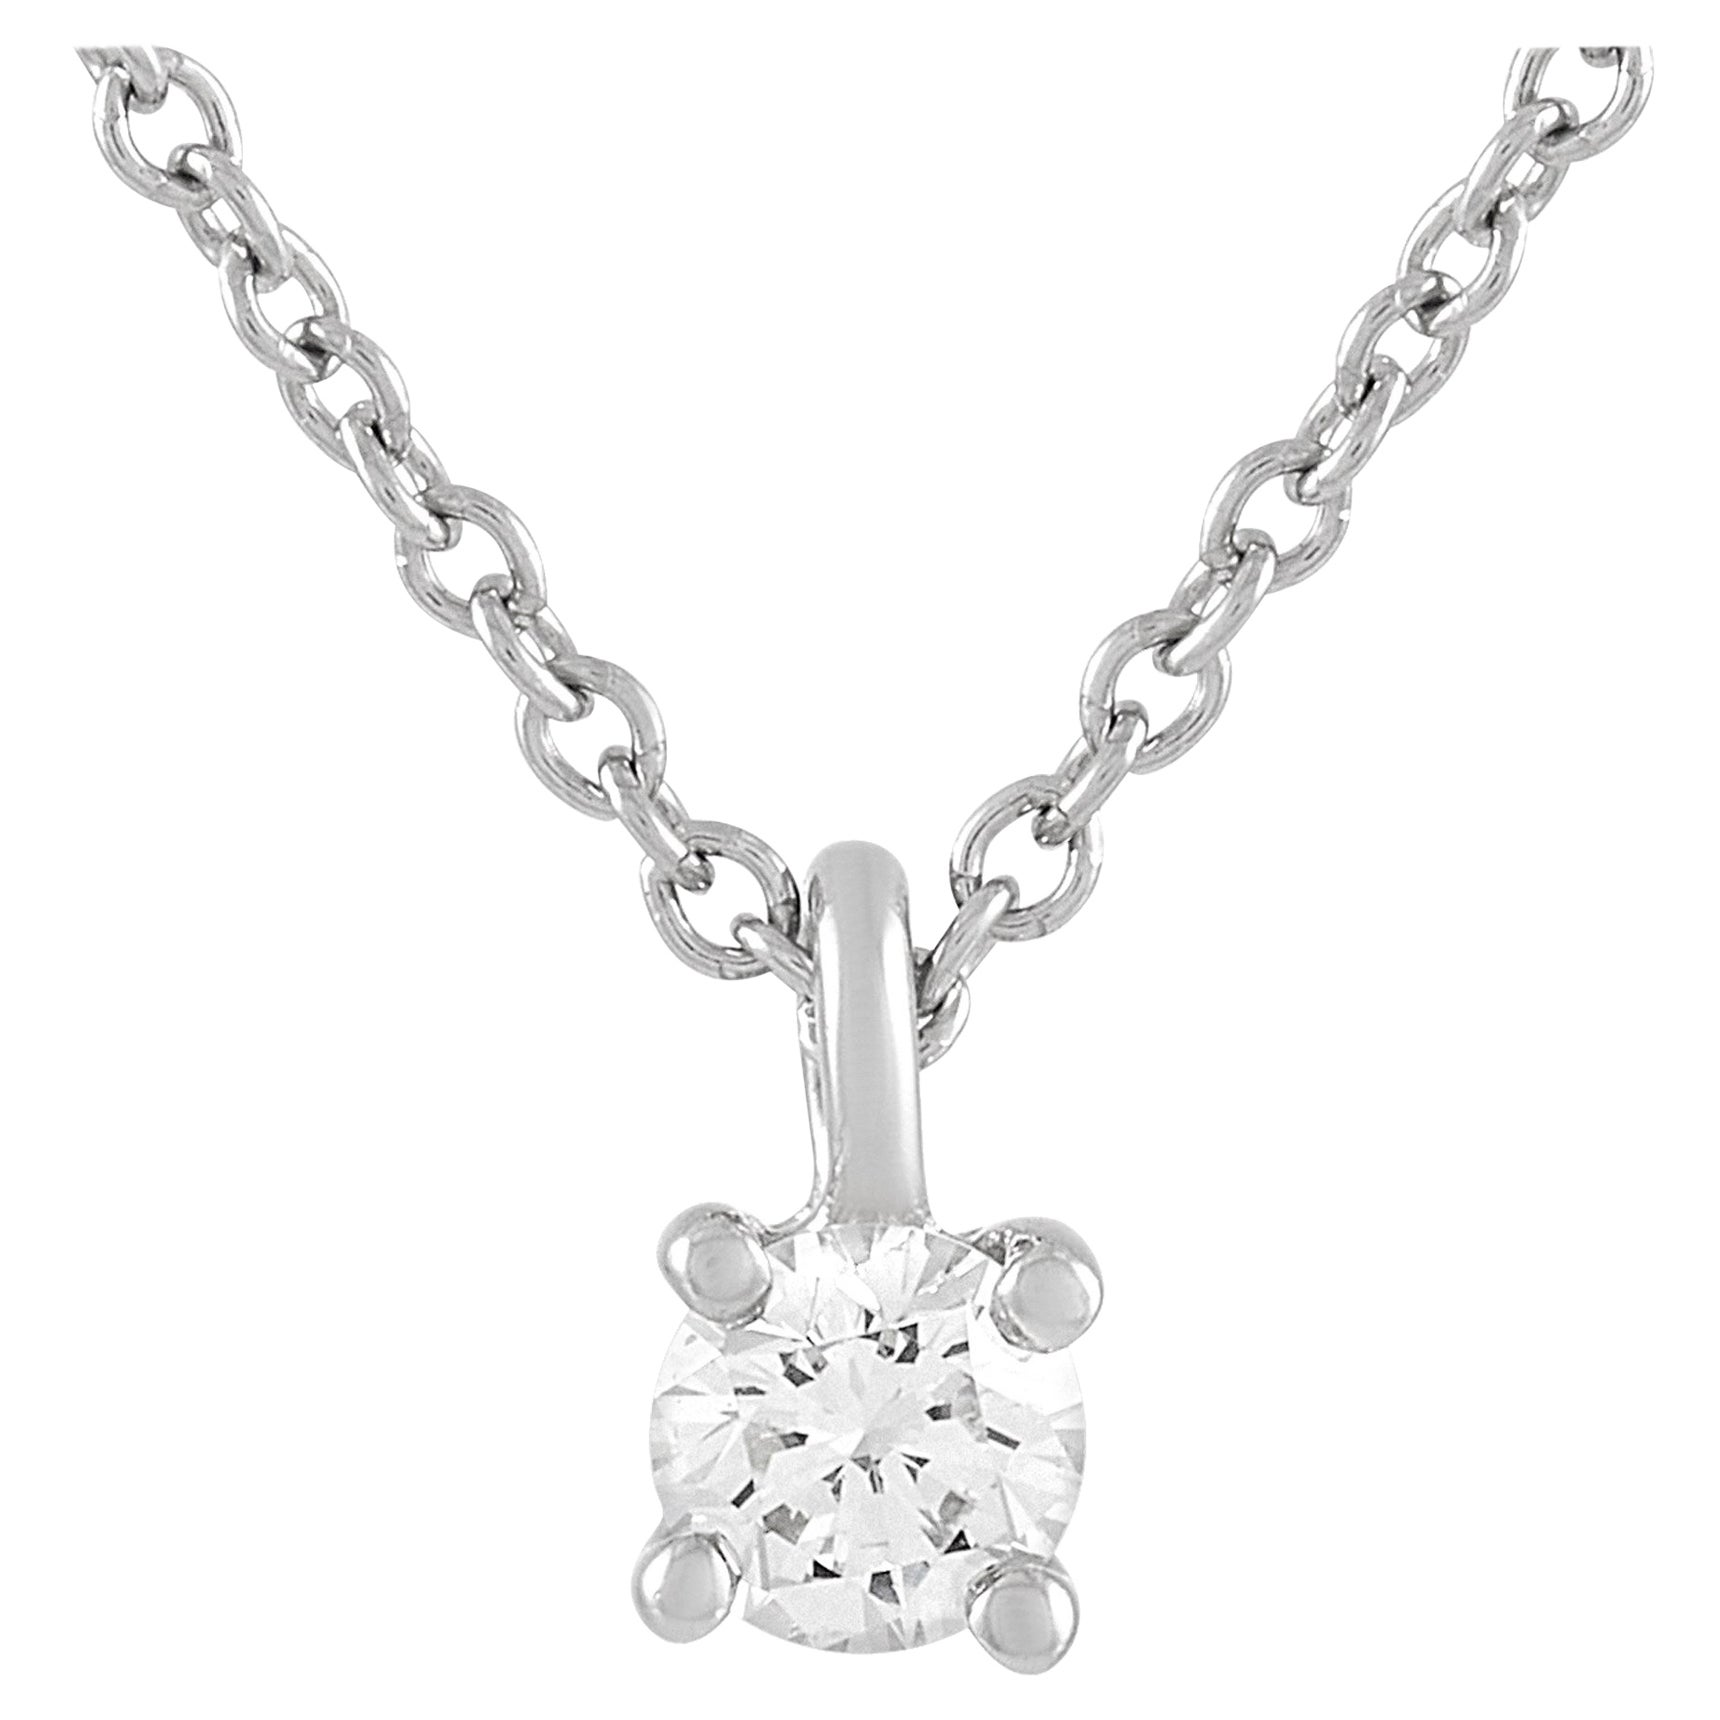 Tiffany & Co. Platinum 0.15 Carat Diamond Solitaire Necklace